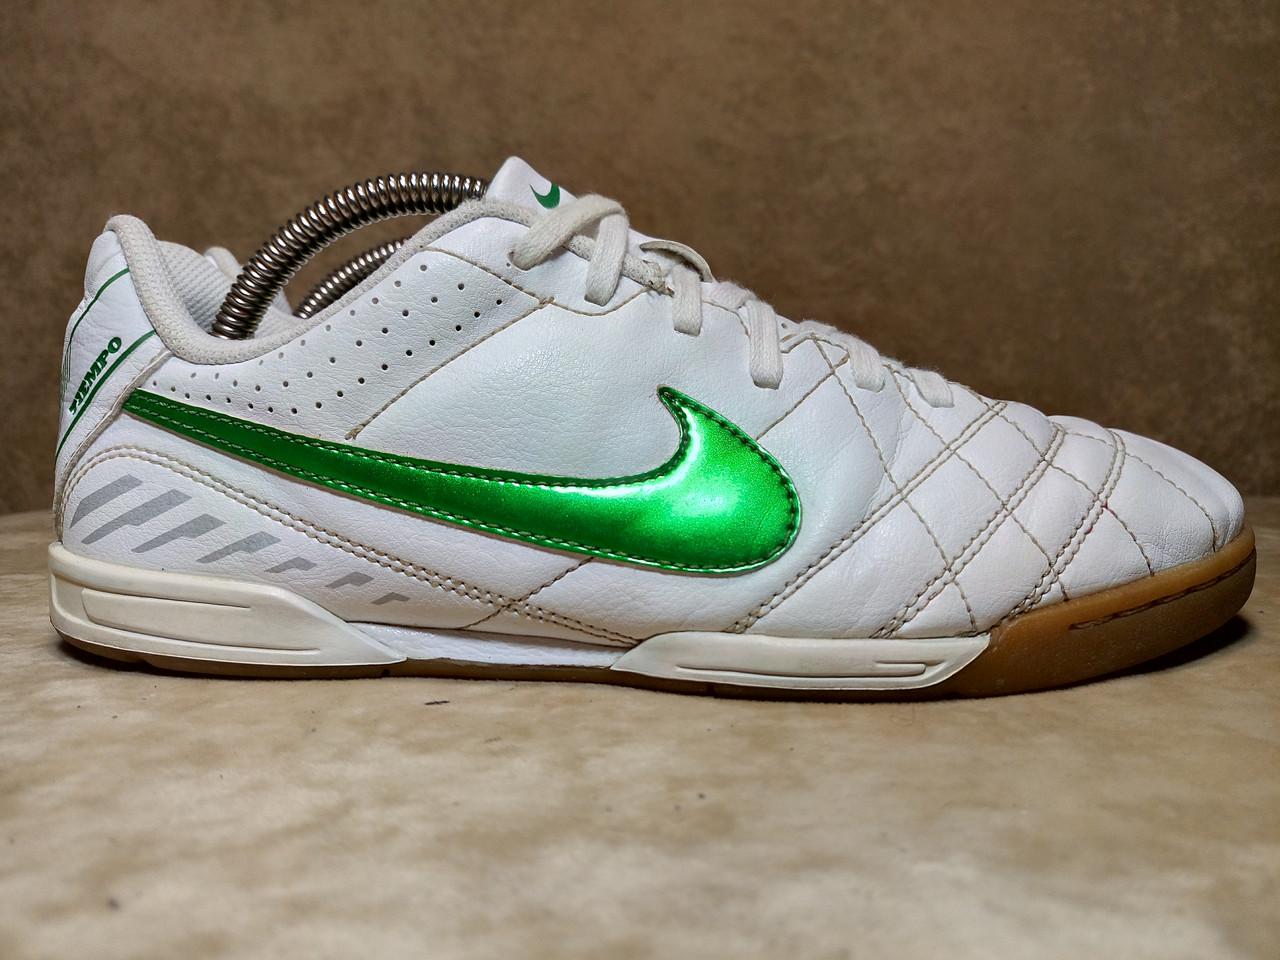 23c14a74 Кроссовки для зала Nike Tiempo футзалки. Индонезия. Оригинал. 38 р./ 24